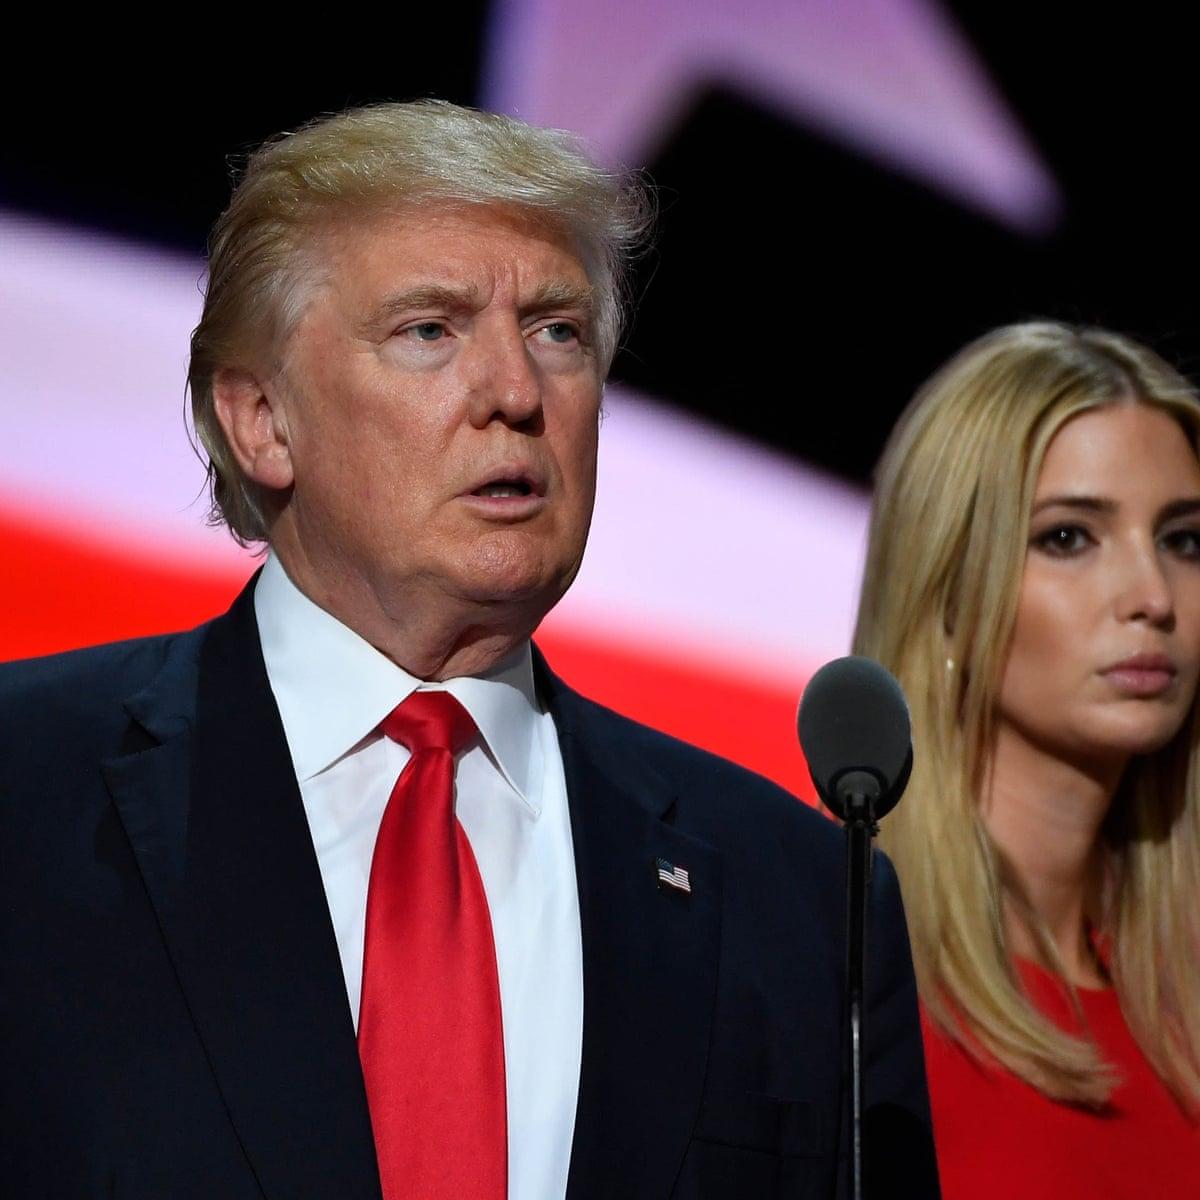 Ivanka Trump Says Liberals Have Unrealistic Expectations Of Her Ivanka Trump The Guardian